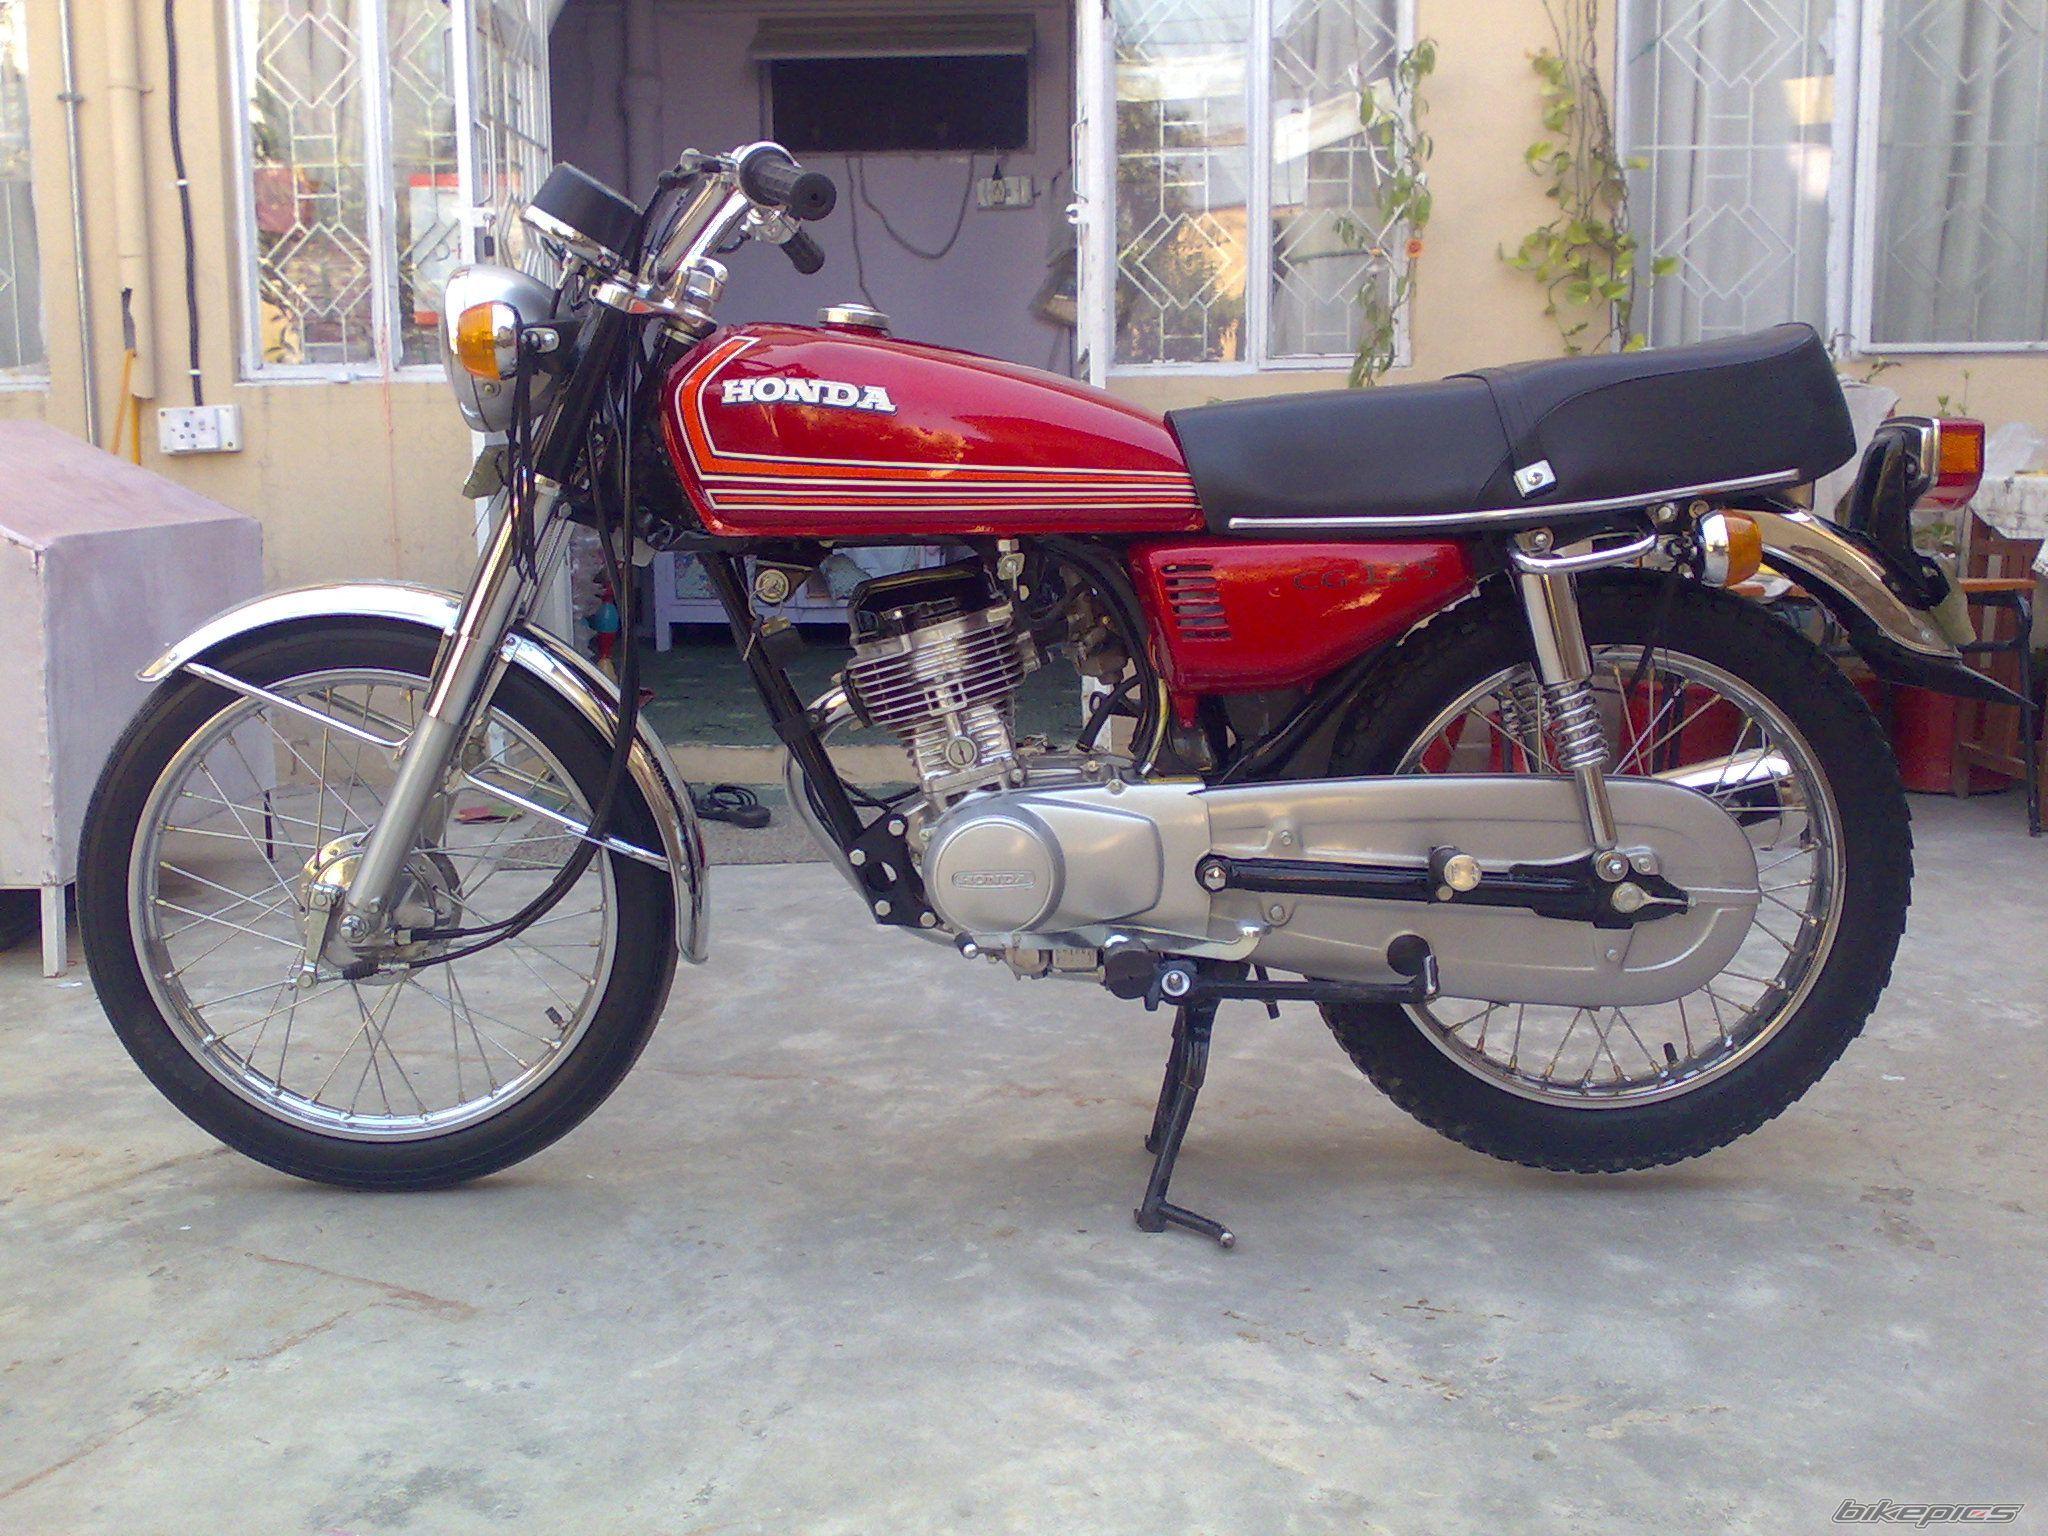 Head Light Change - Honda CG 125 Deluxe - Honda Bikes - PakWheels Forums